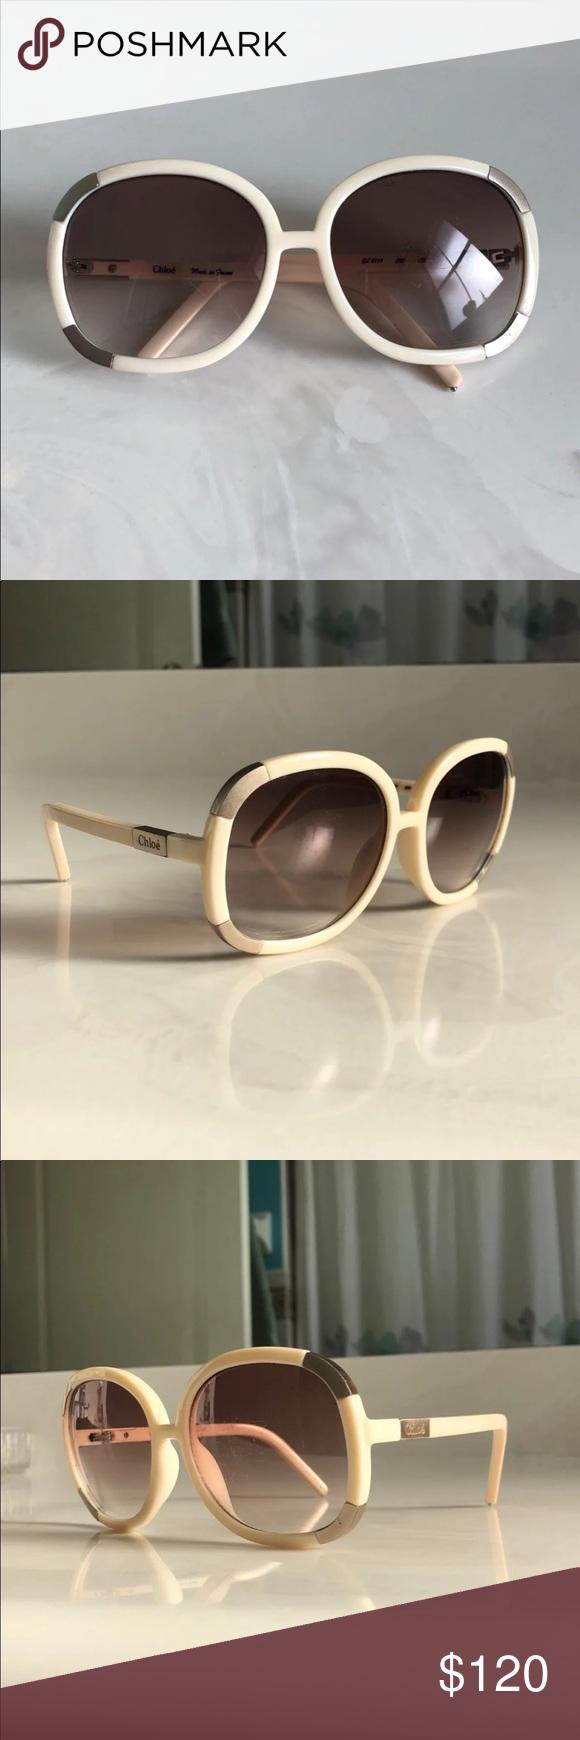 f1228dee818 Chloe Ivory Myrte sunglasses Authentic lenses. Oversized style